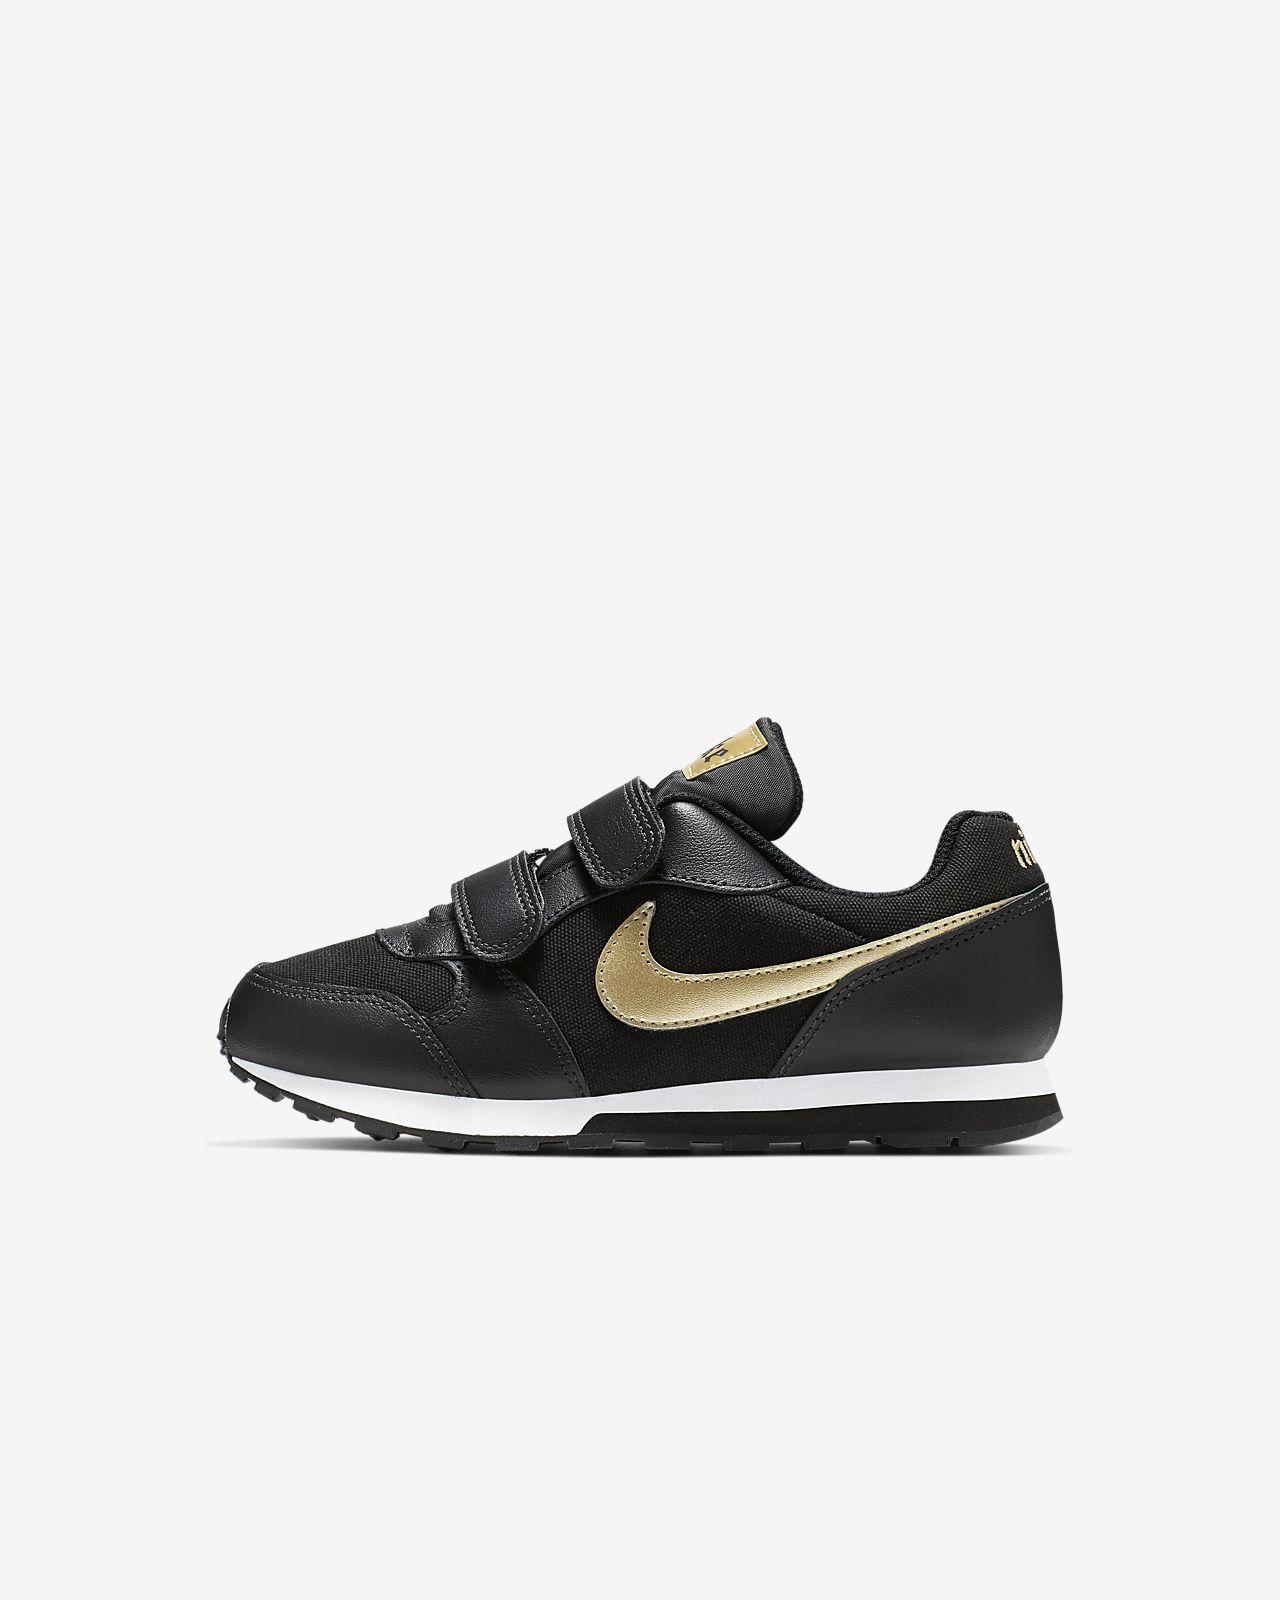 Schuh Für Md Runner Kinder 2 Vtb Jüngere Nike 31JcFTlK